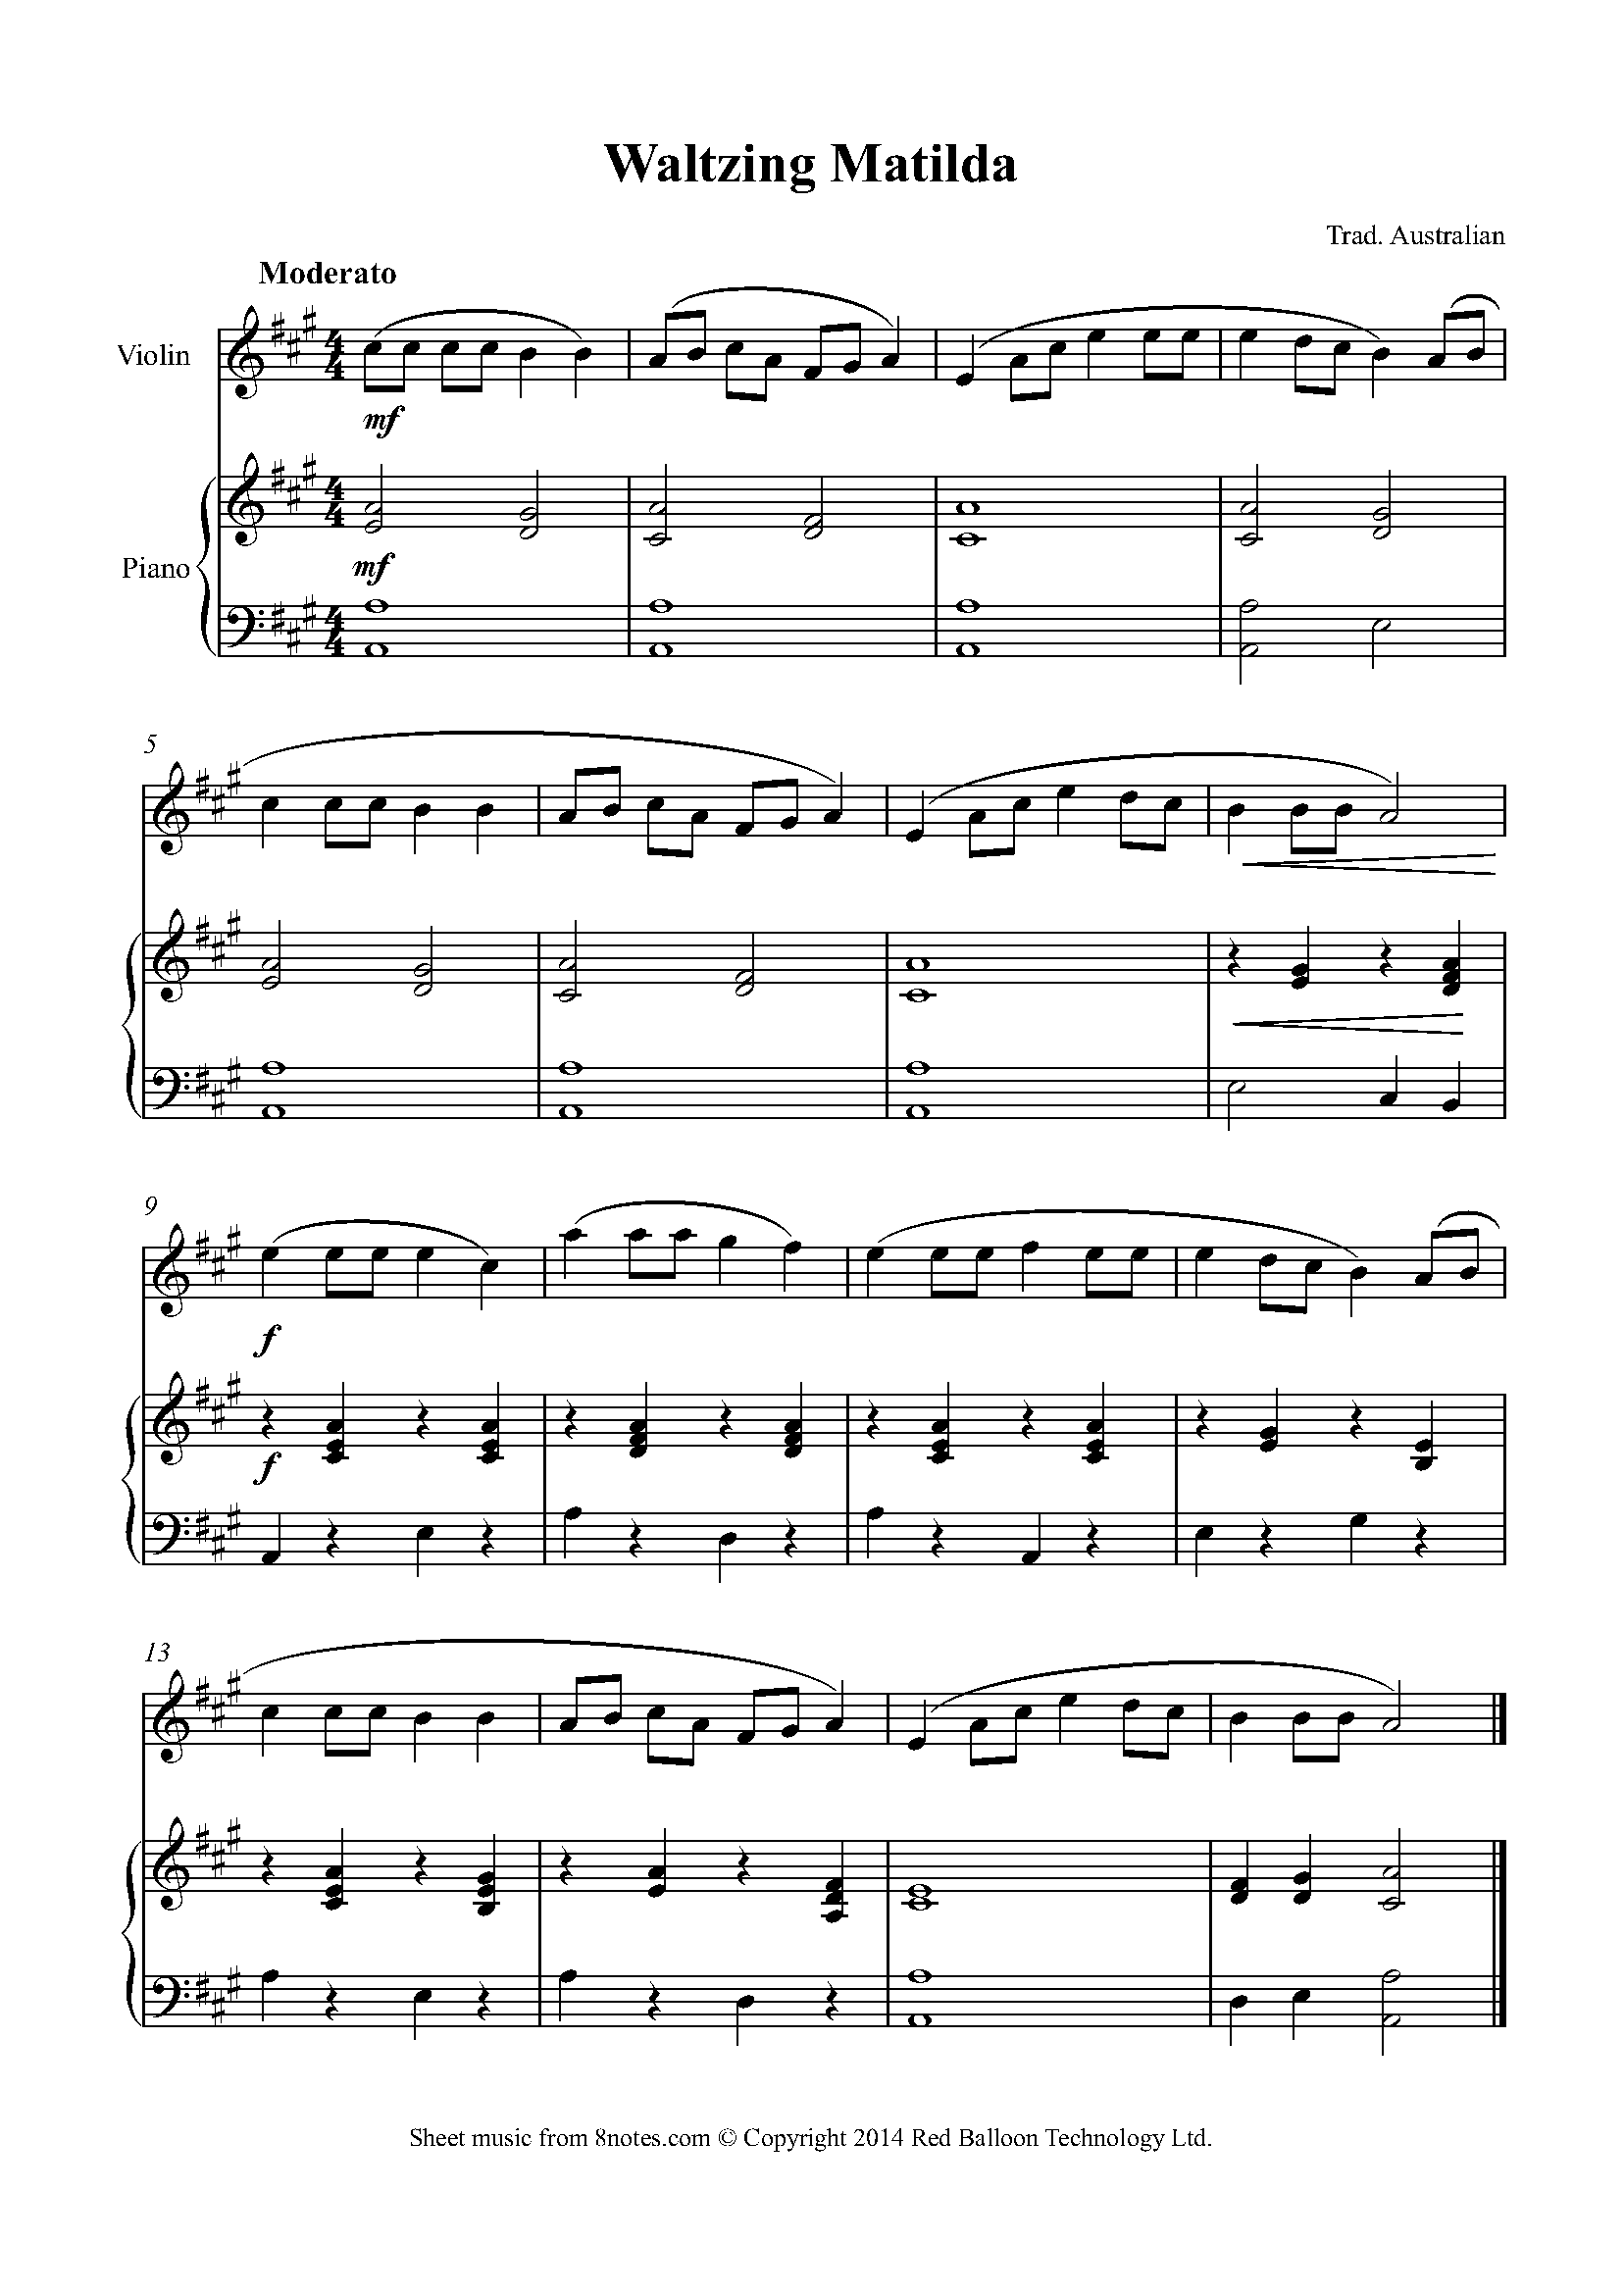 Waltzing Matilda Sheet Music For Violin